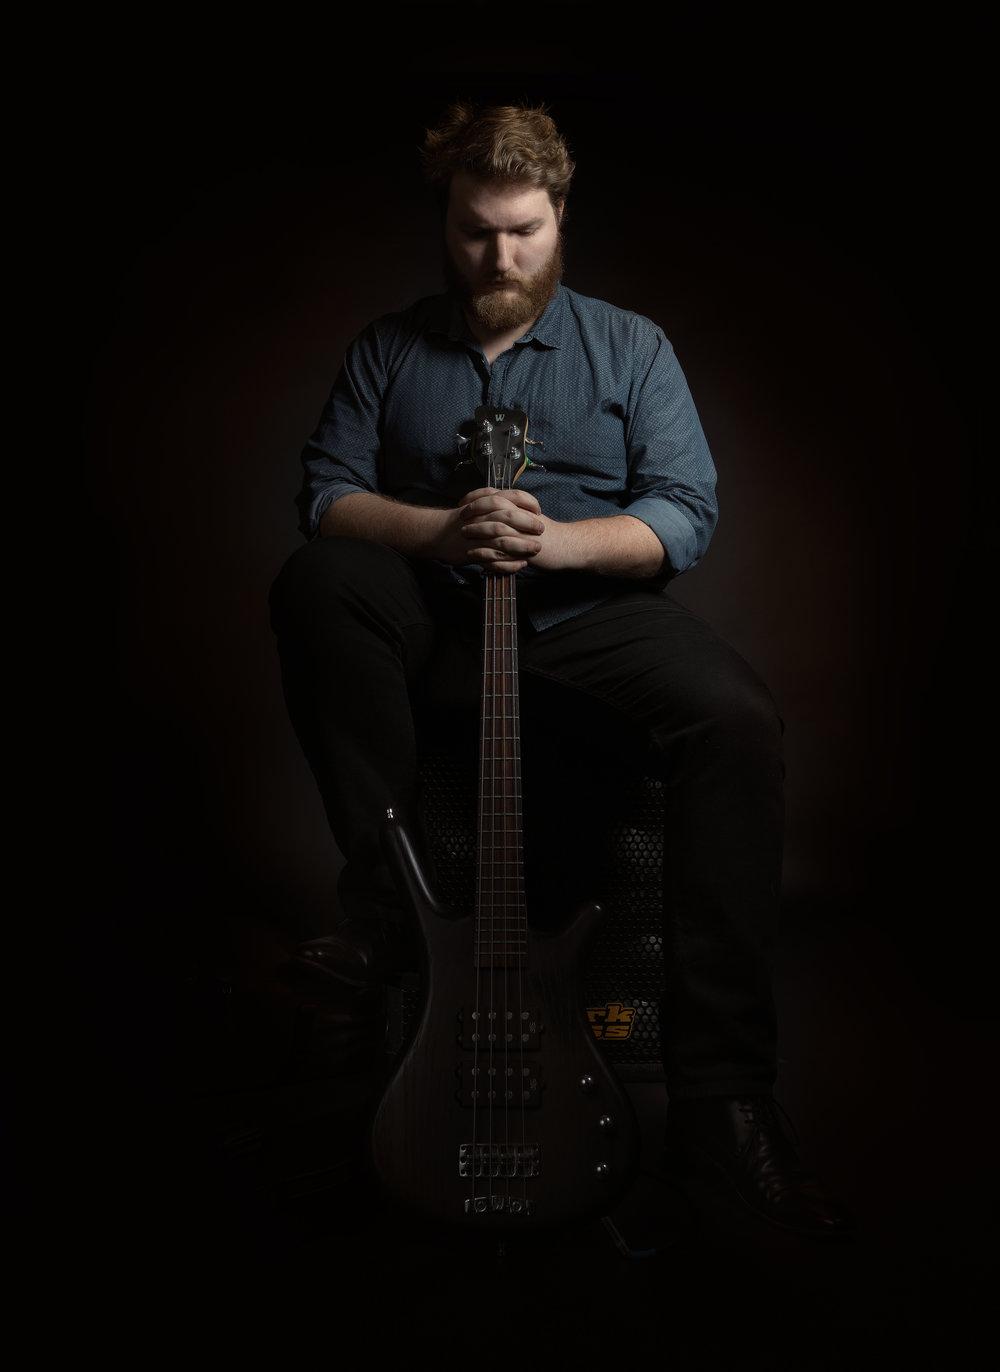 Blake the Basist